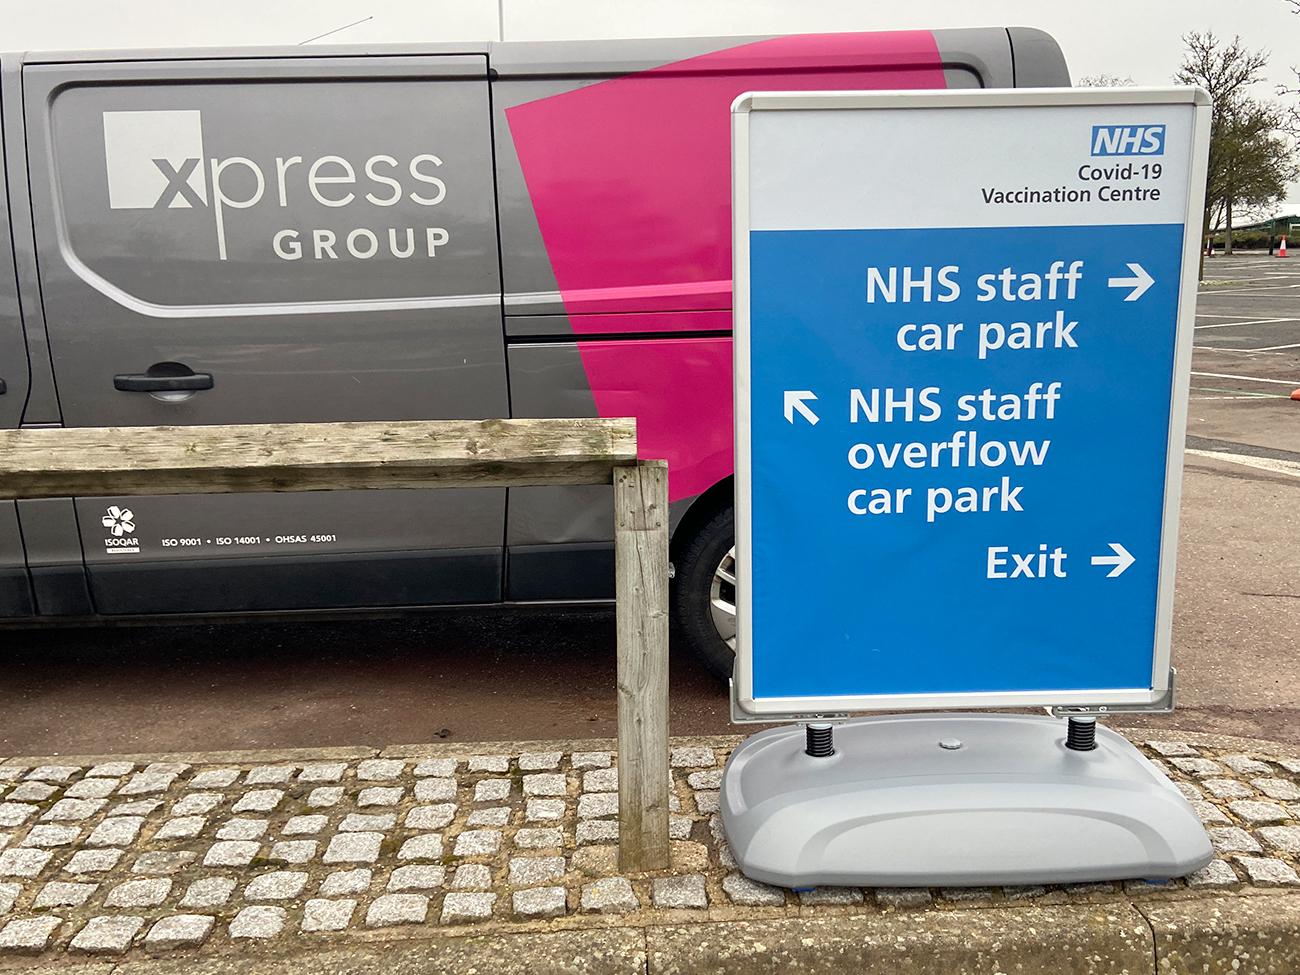 NHS Vaccination Centre Car Park Signage